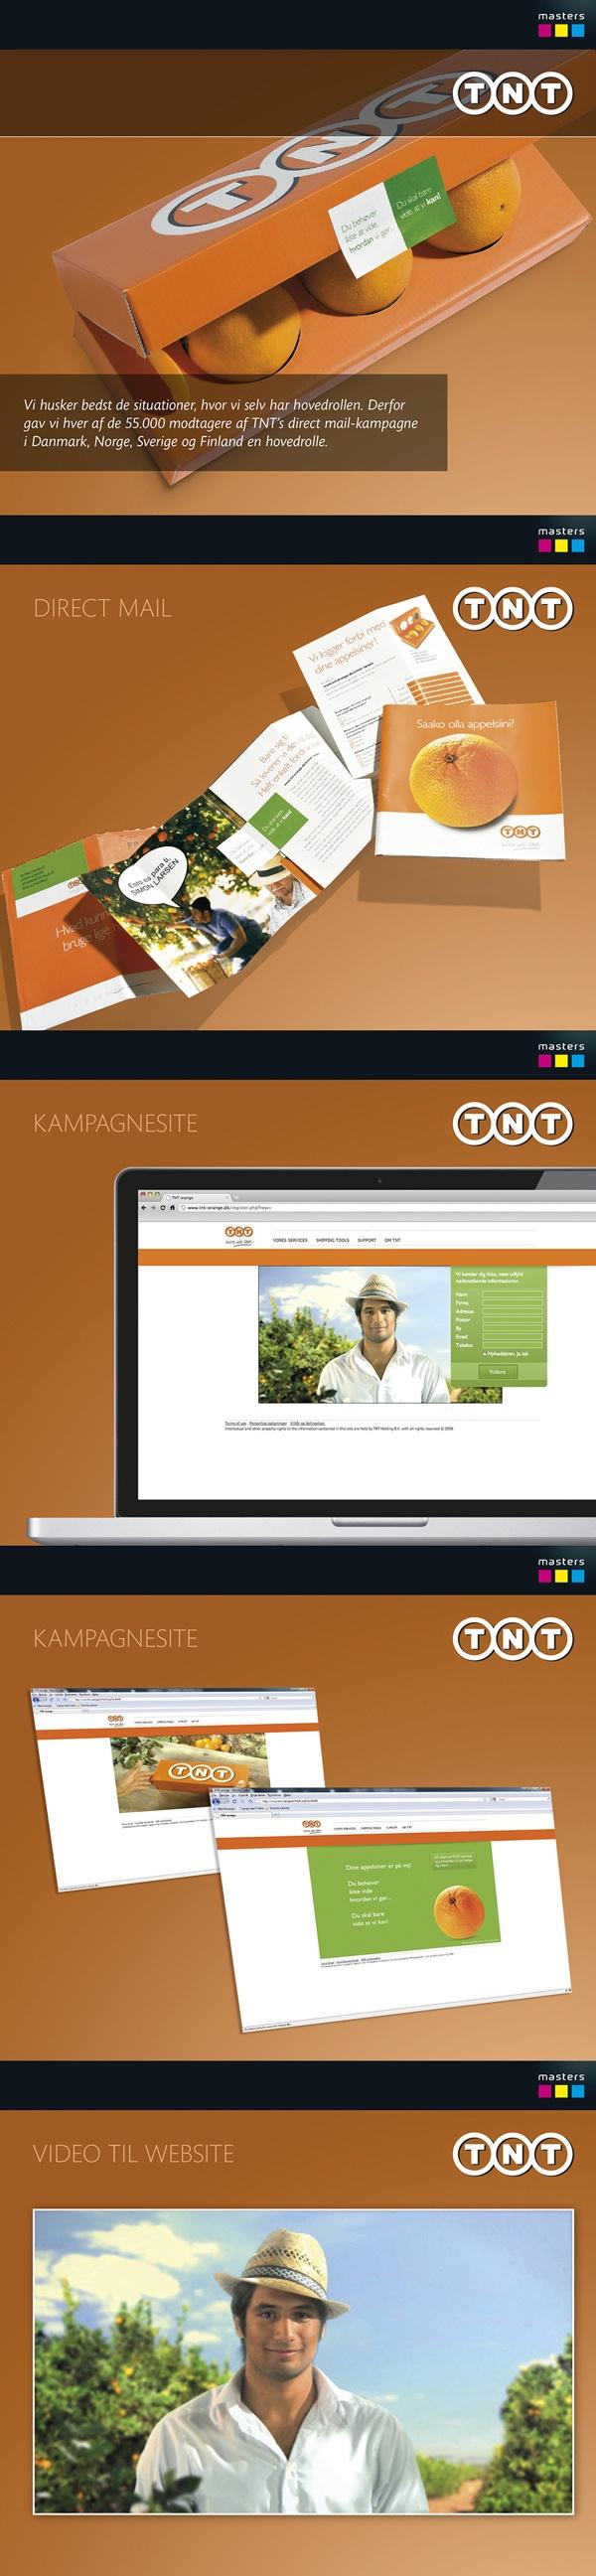 TNT - Kampagne med PURL by Masters Reklame, via Behance #mastersreklame